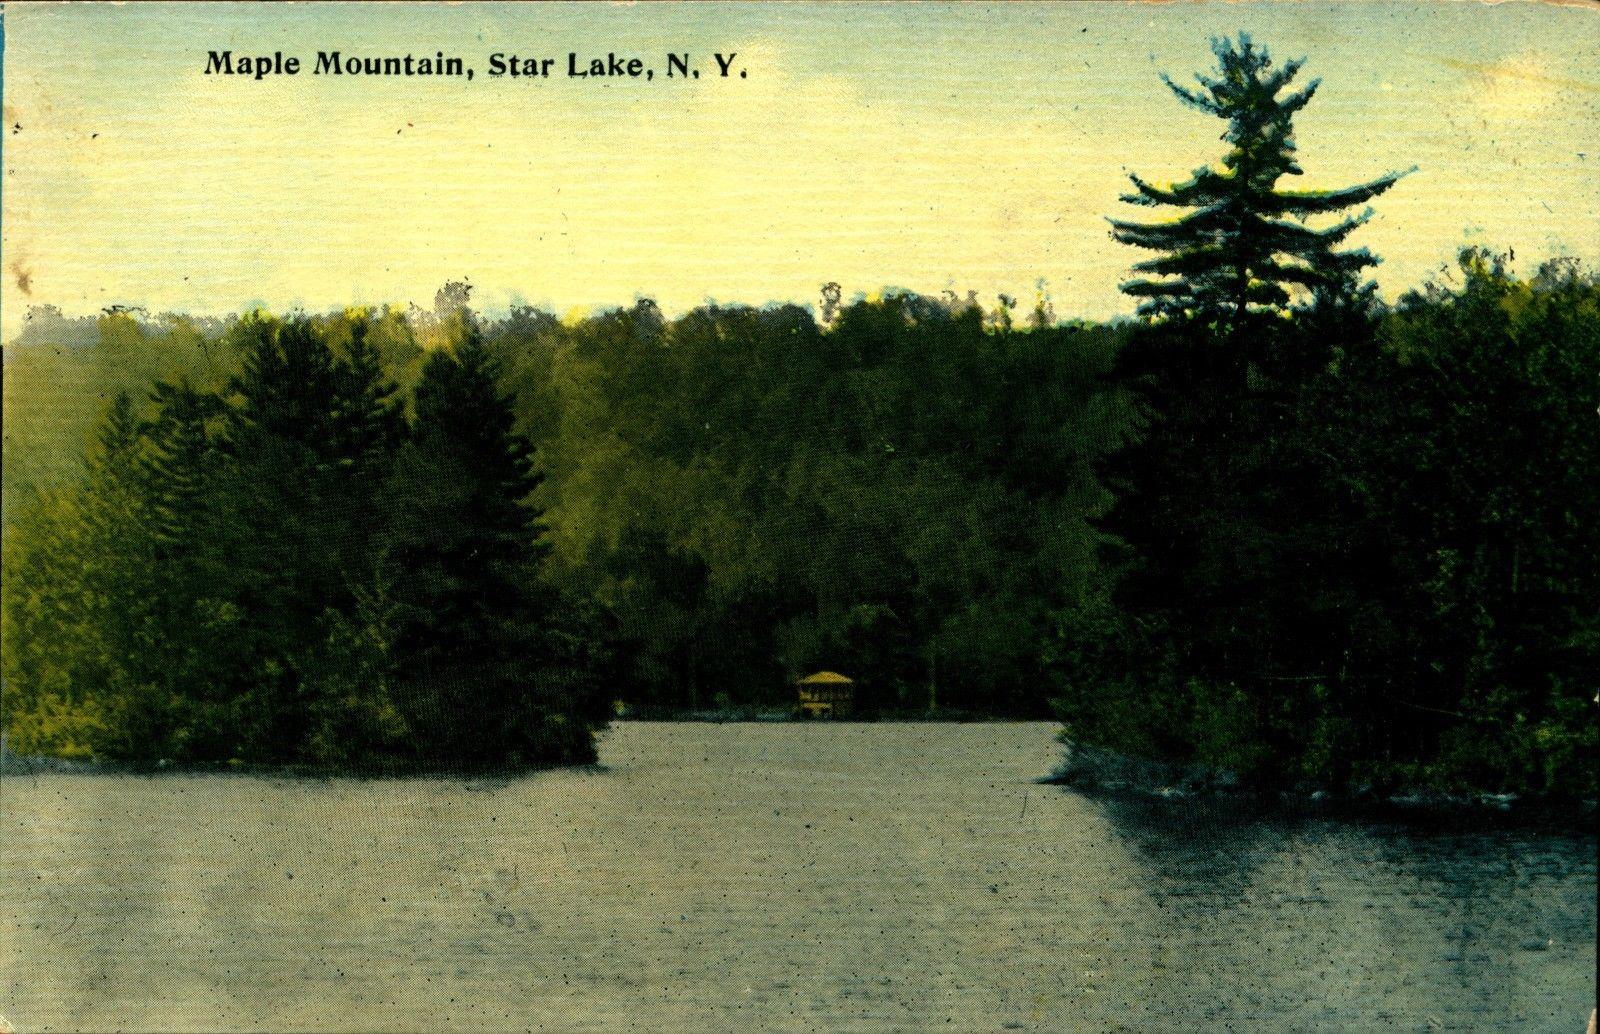 Star Lake Ny >> Star Lake Ny St Lawrence County Maple Mountain Vintage Postcard